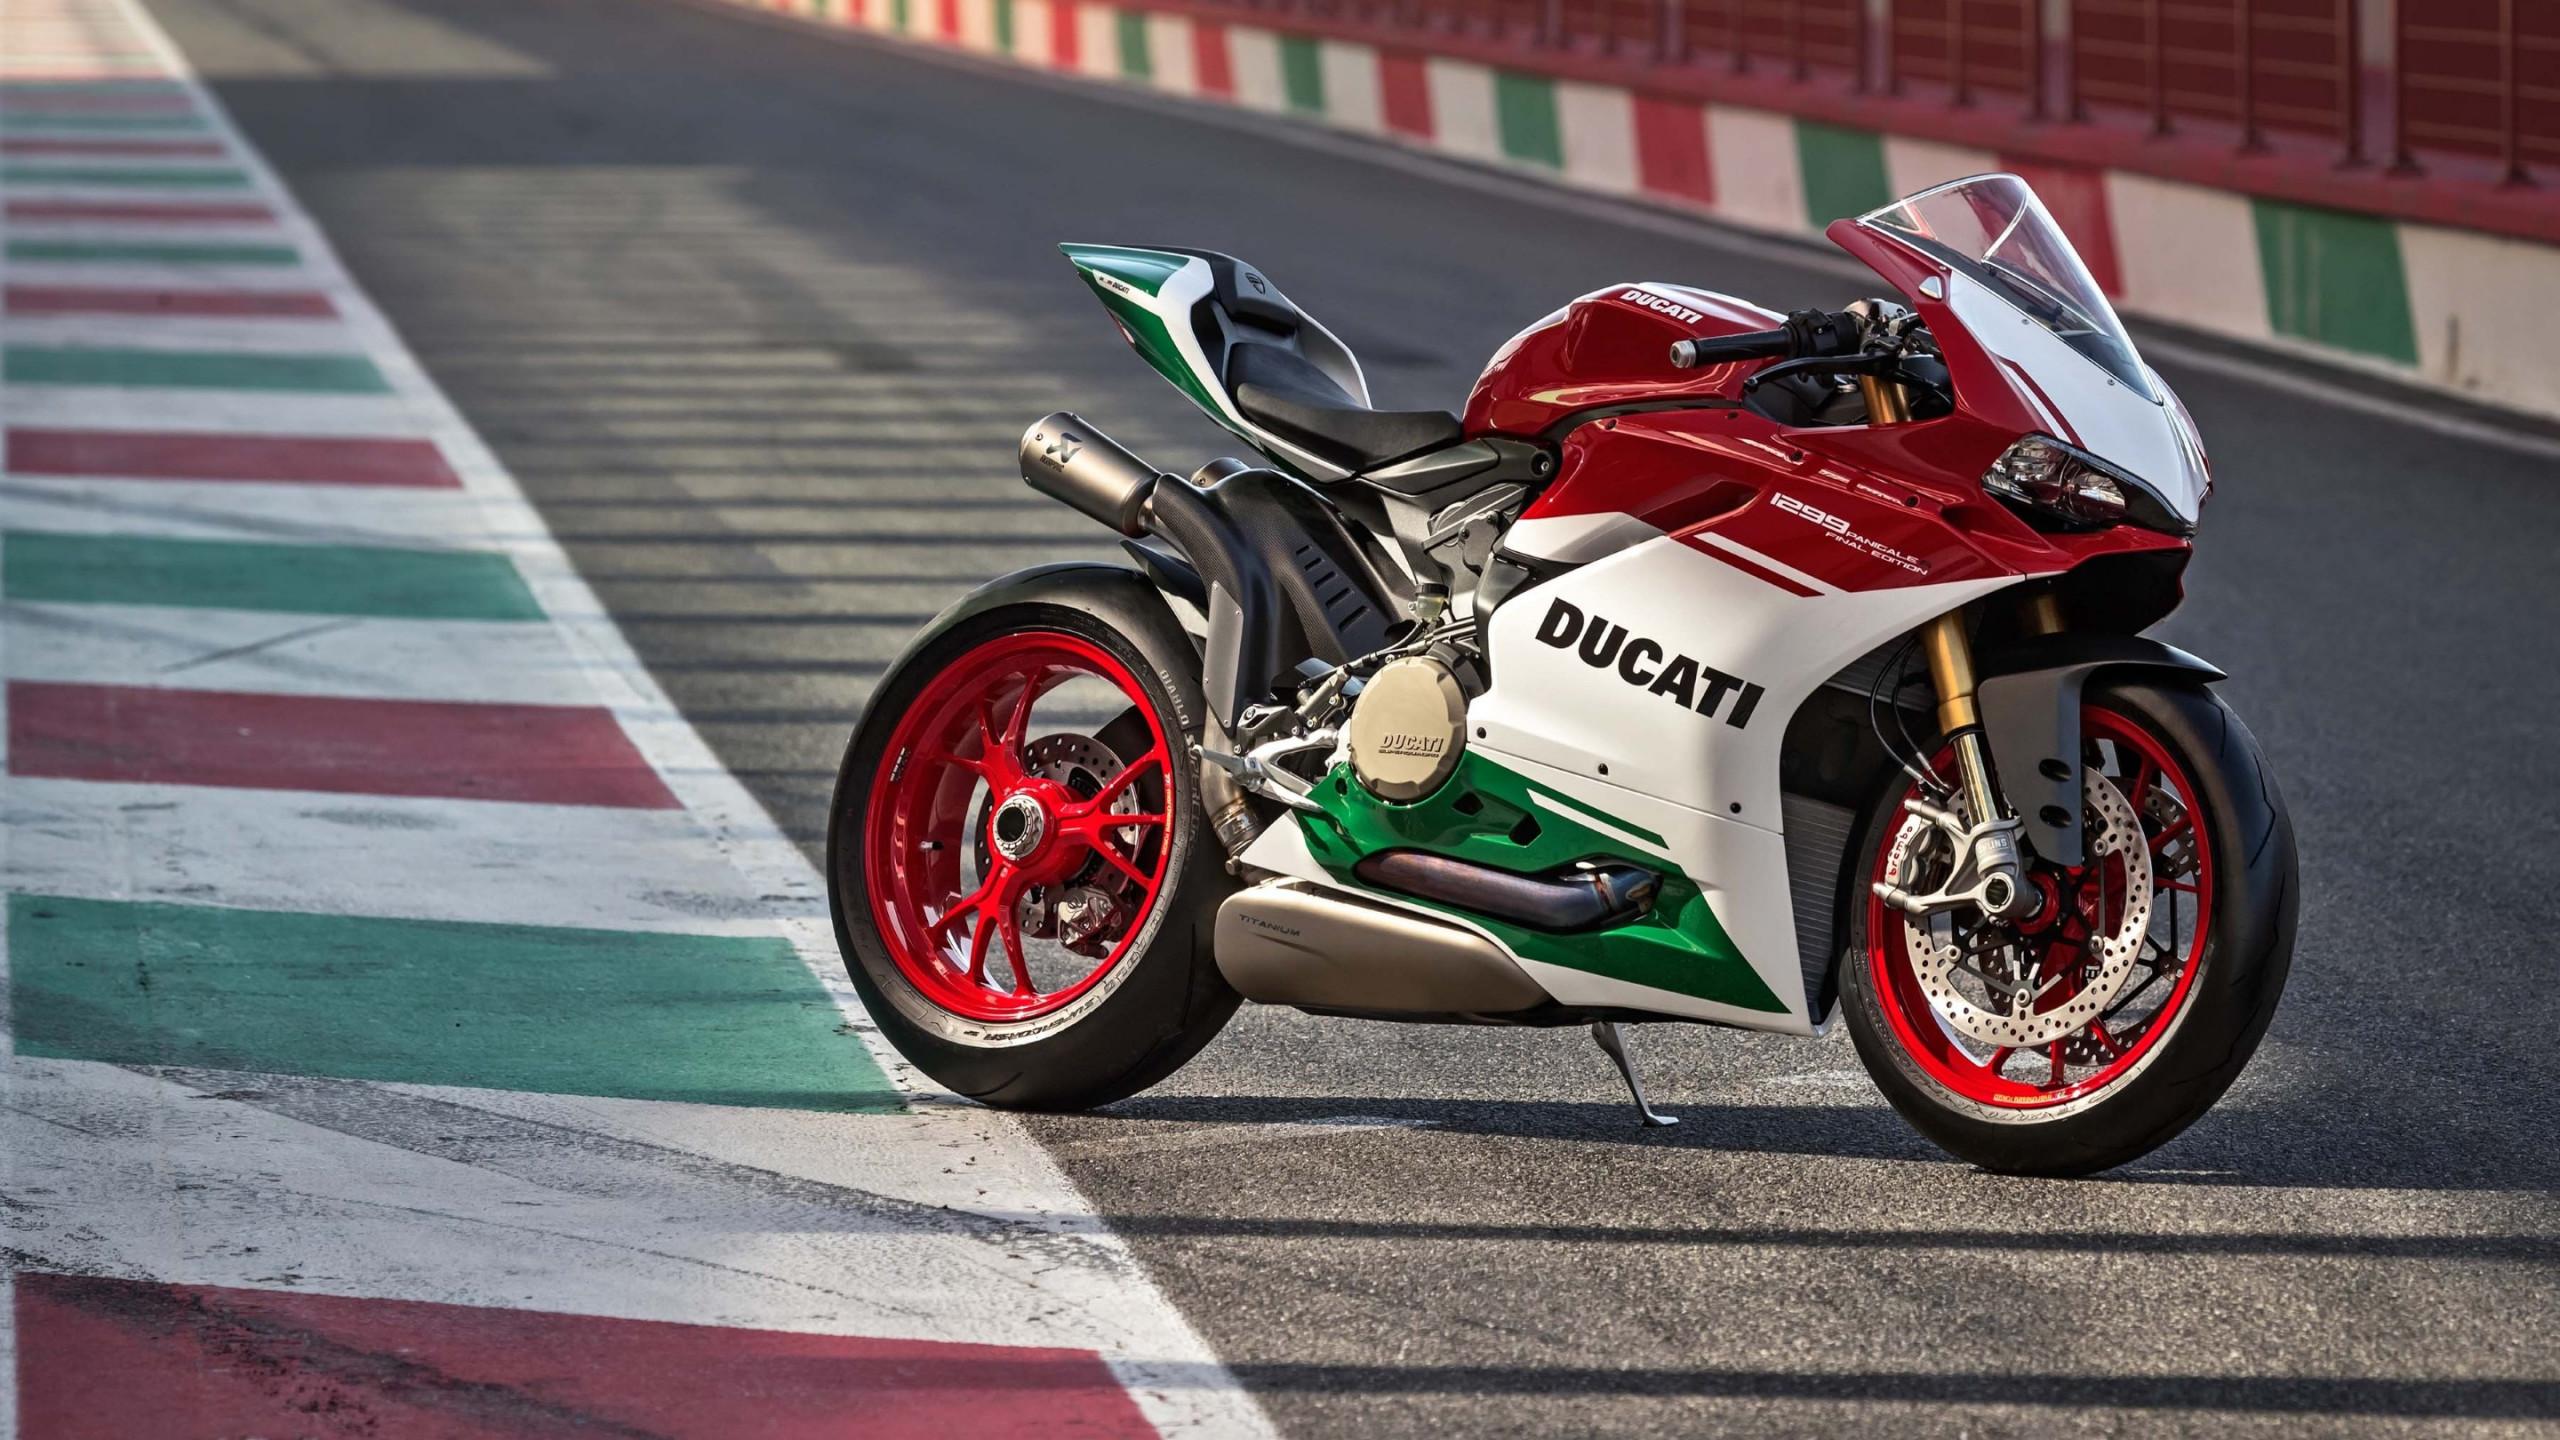 Download wallpaper Ducati 1299 Panigale R 2560x1440 2560x1440